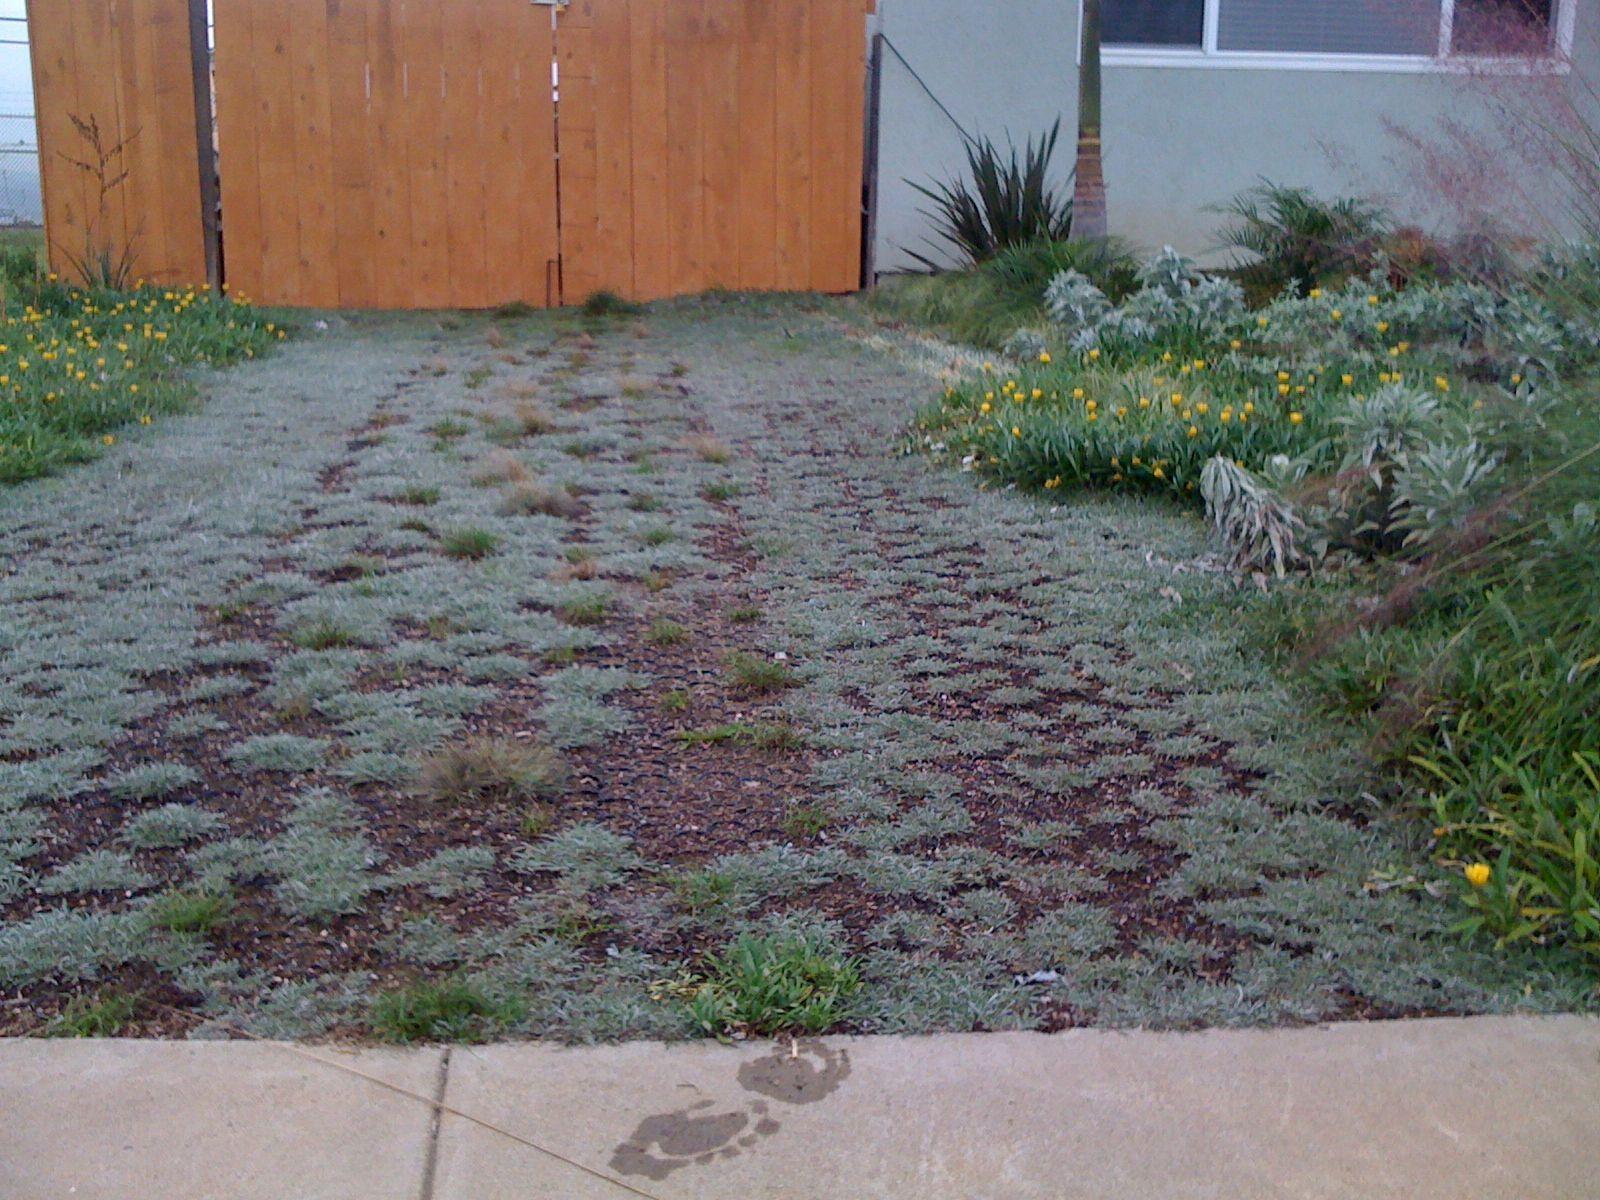 Non-grass and mulch on permeable pavers | Urban garden ... on Non Grass Backyard Ideas id=67945